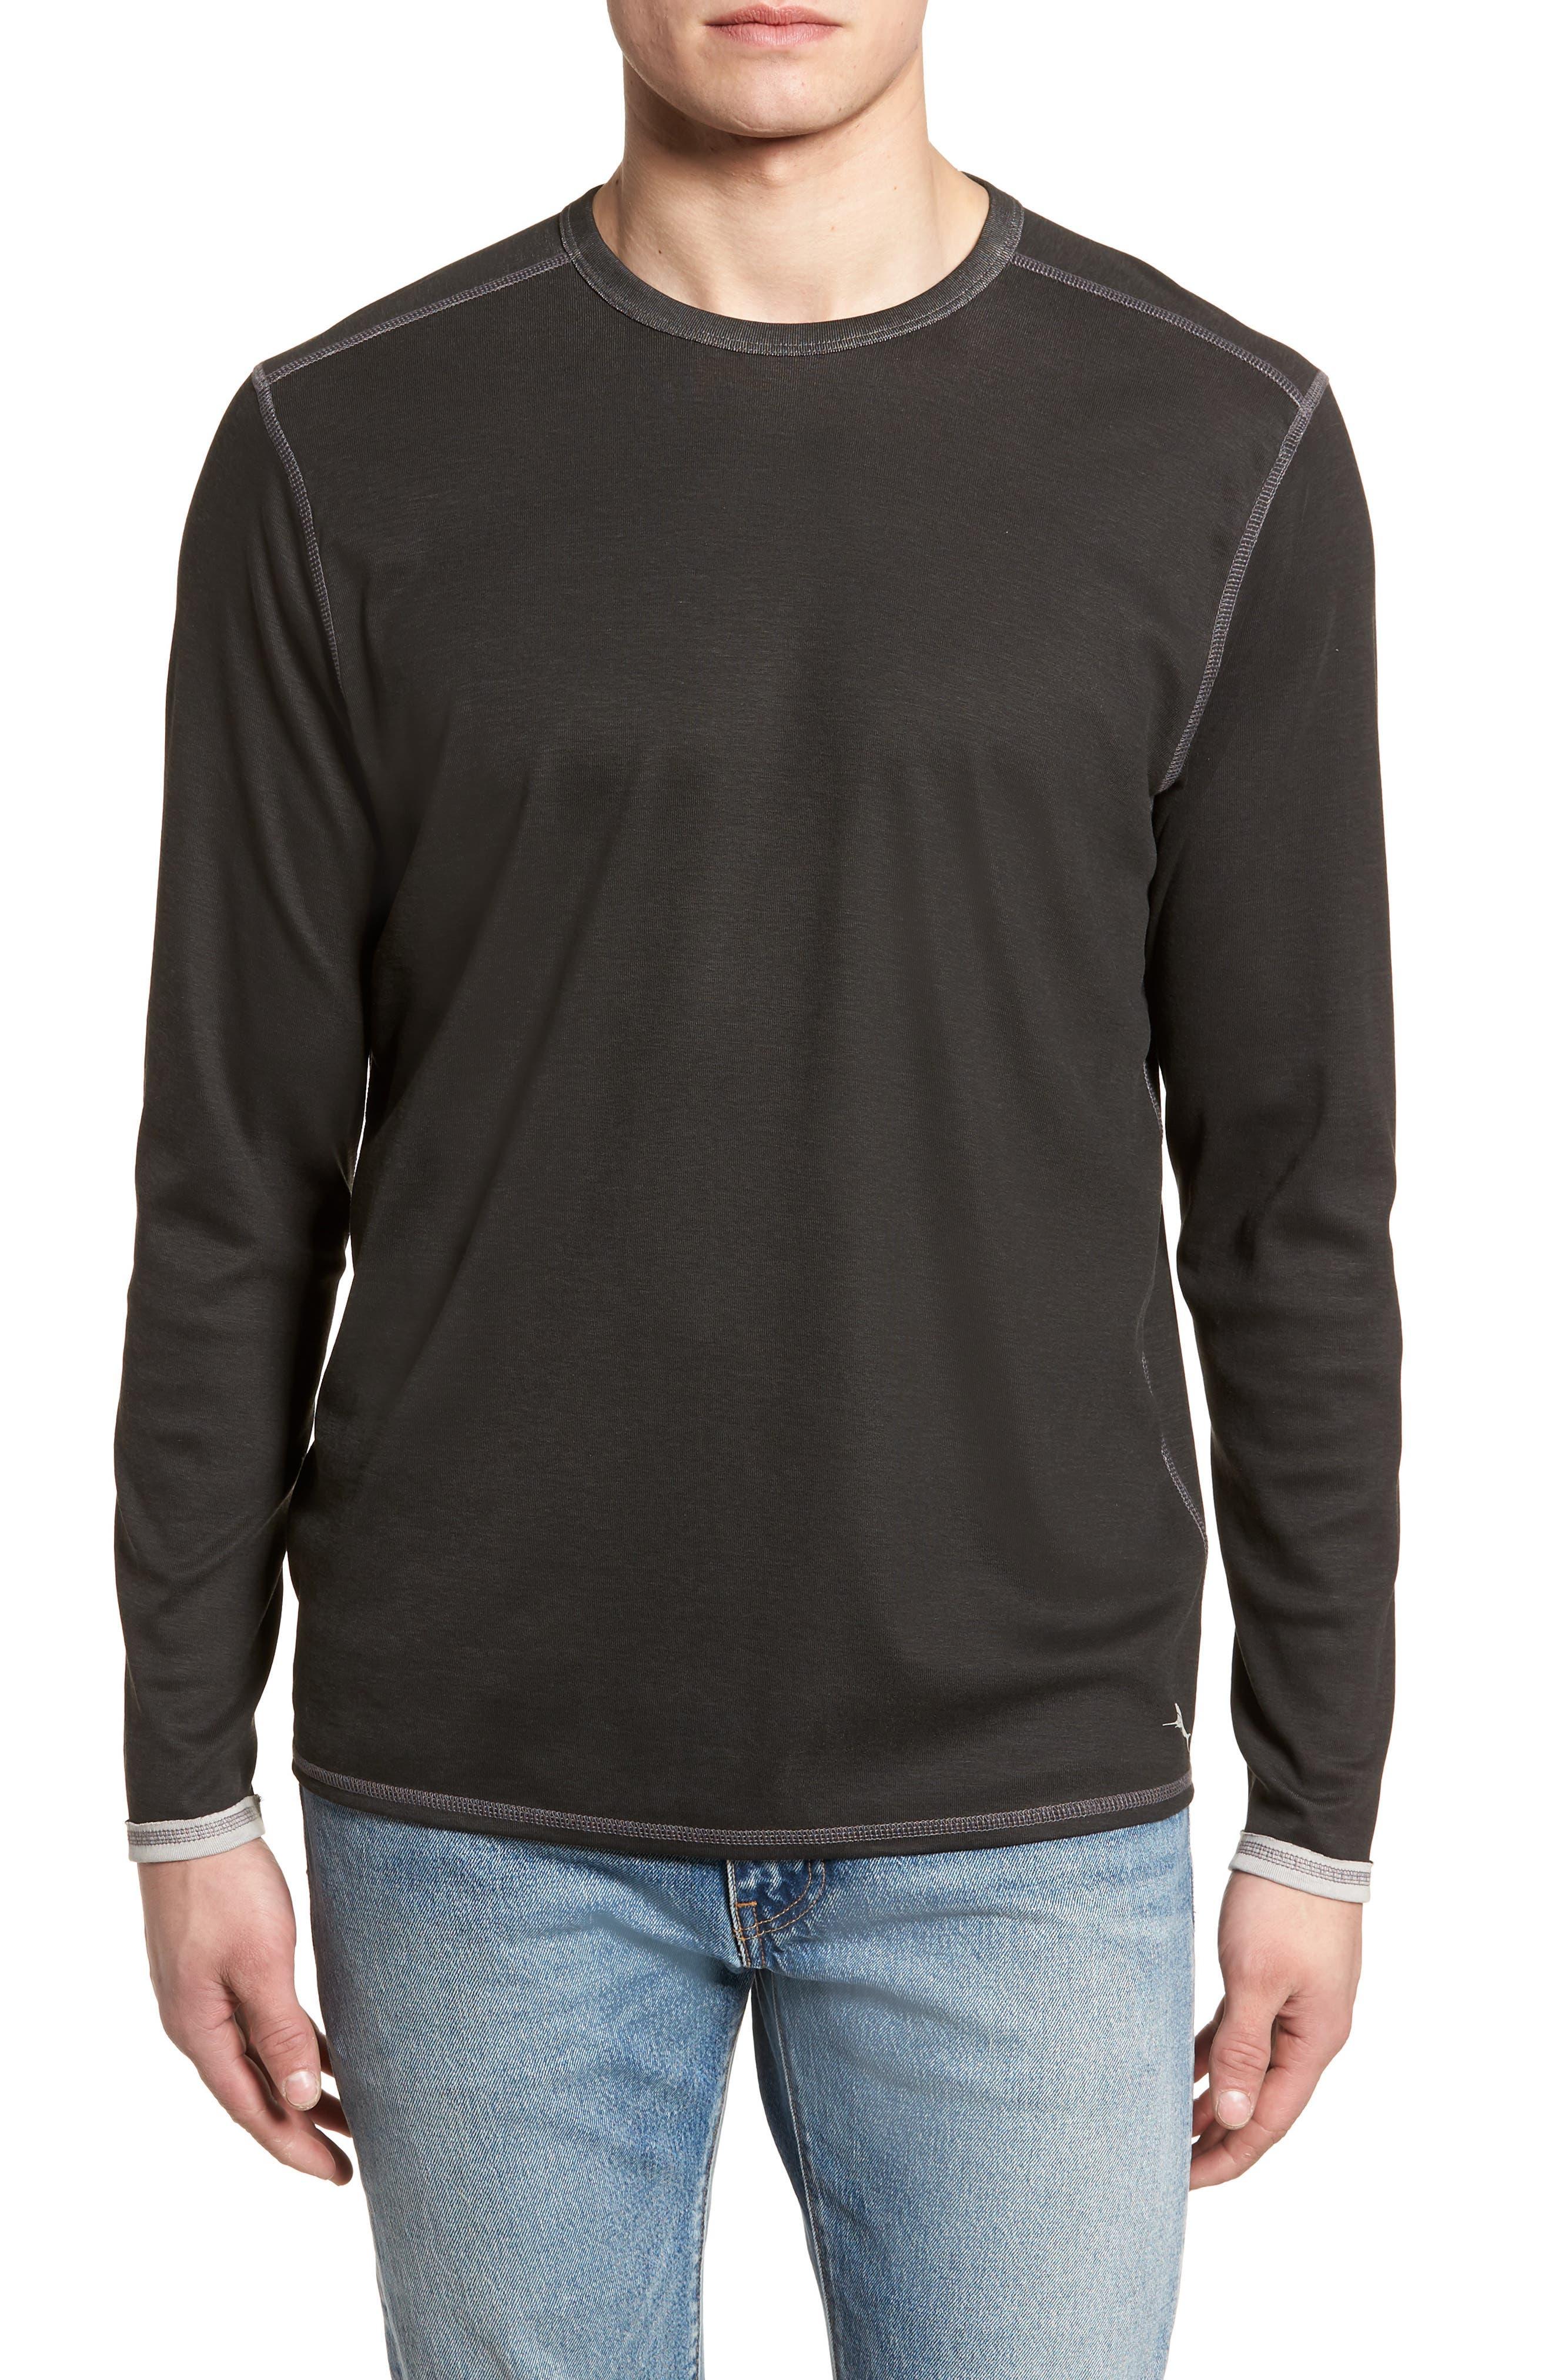 Dual in the Sun Reversible T-Shirt,                         Main,                         color, 001